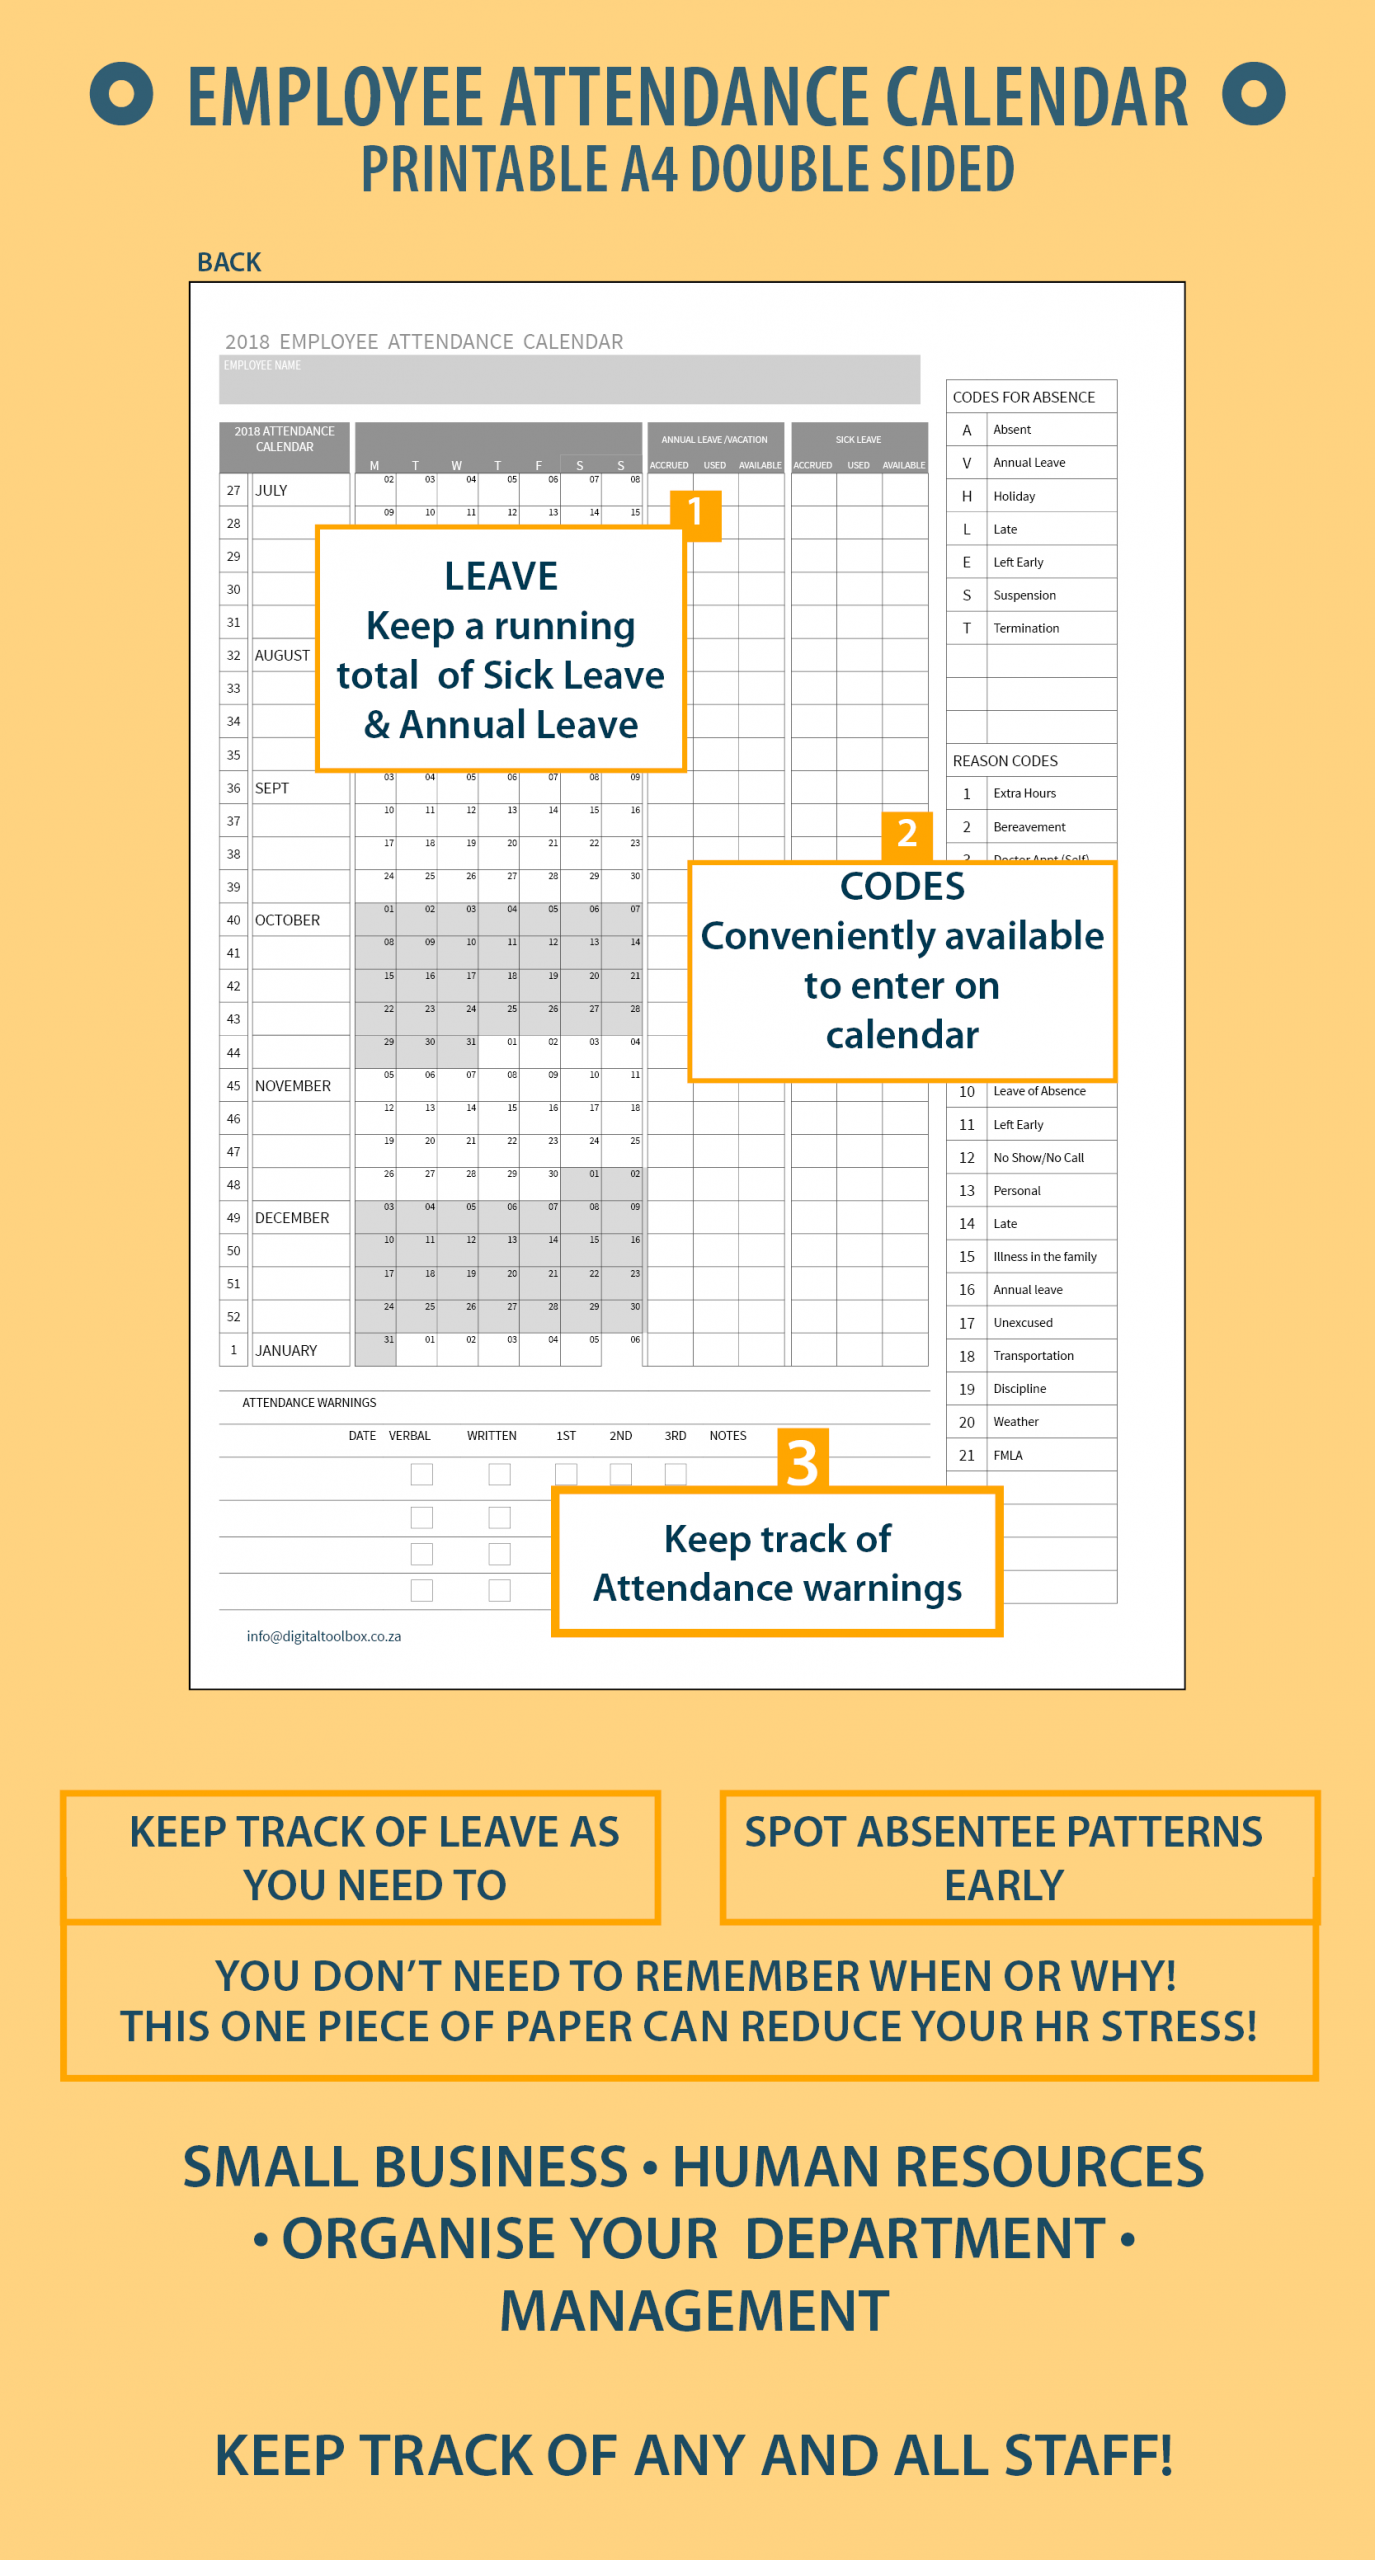 2019 A4 Printable Employee Attendance Calendar/tracker For